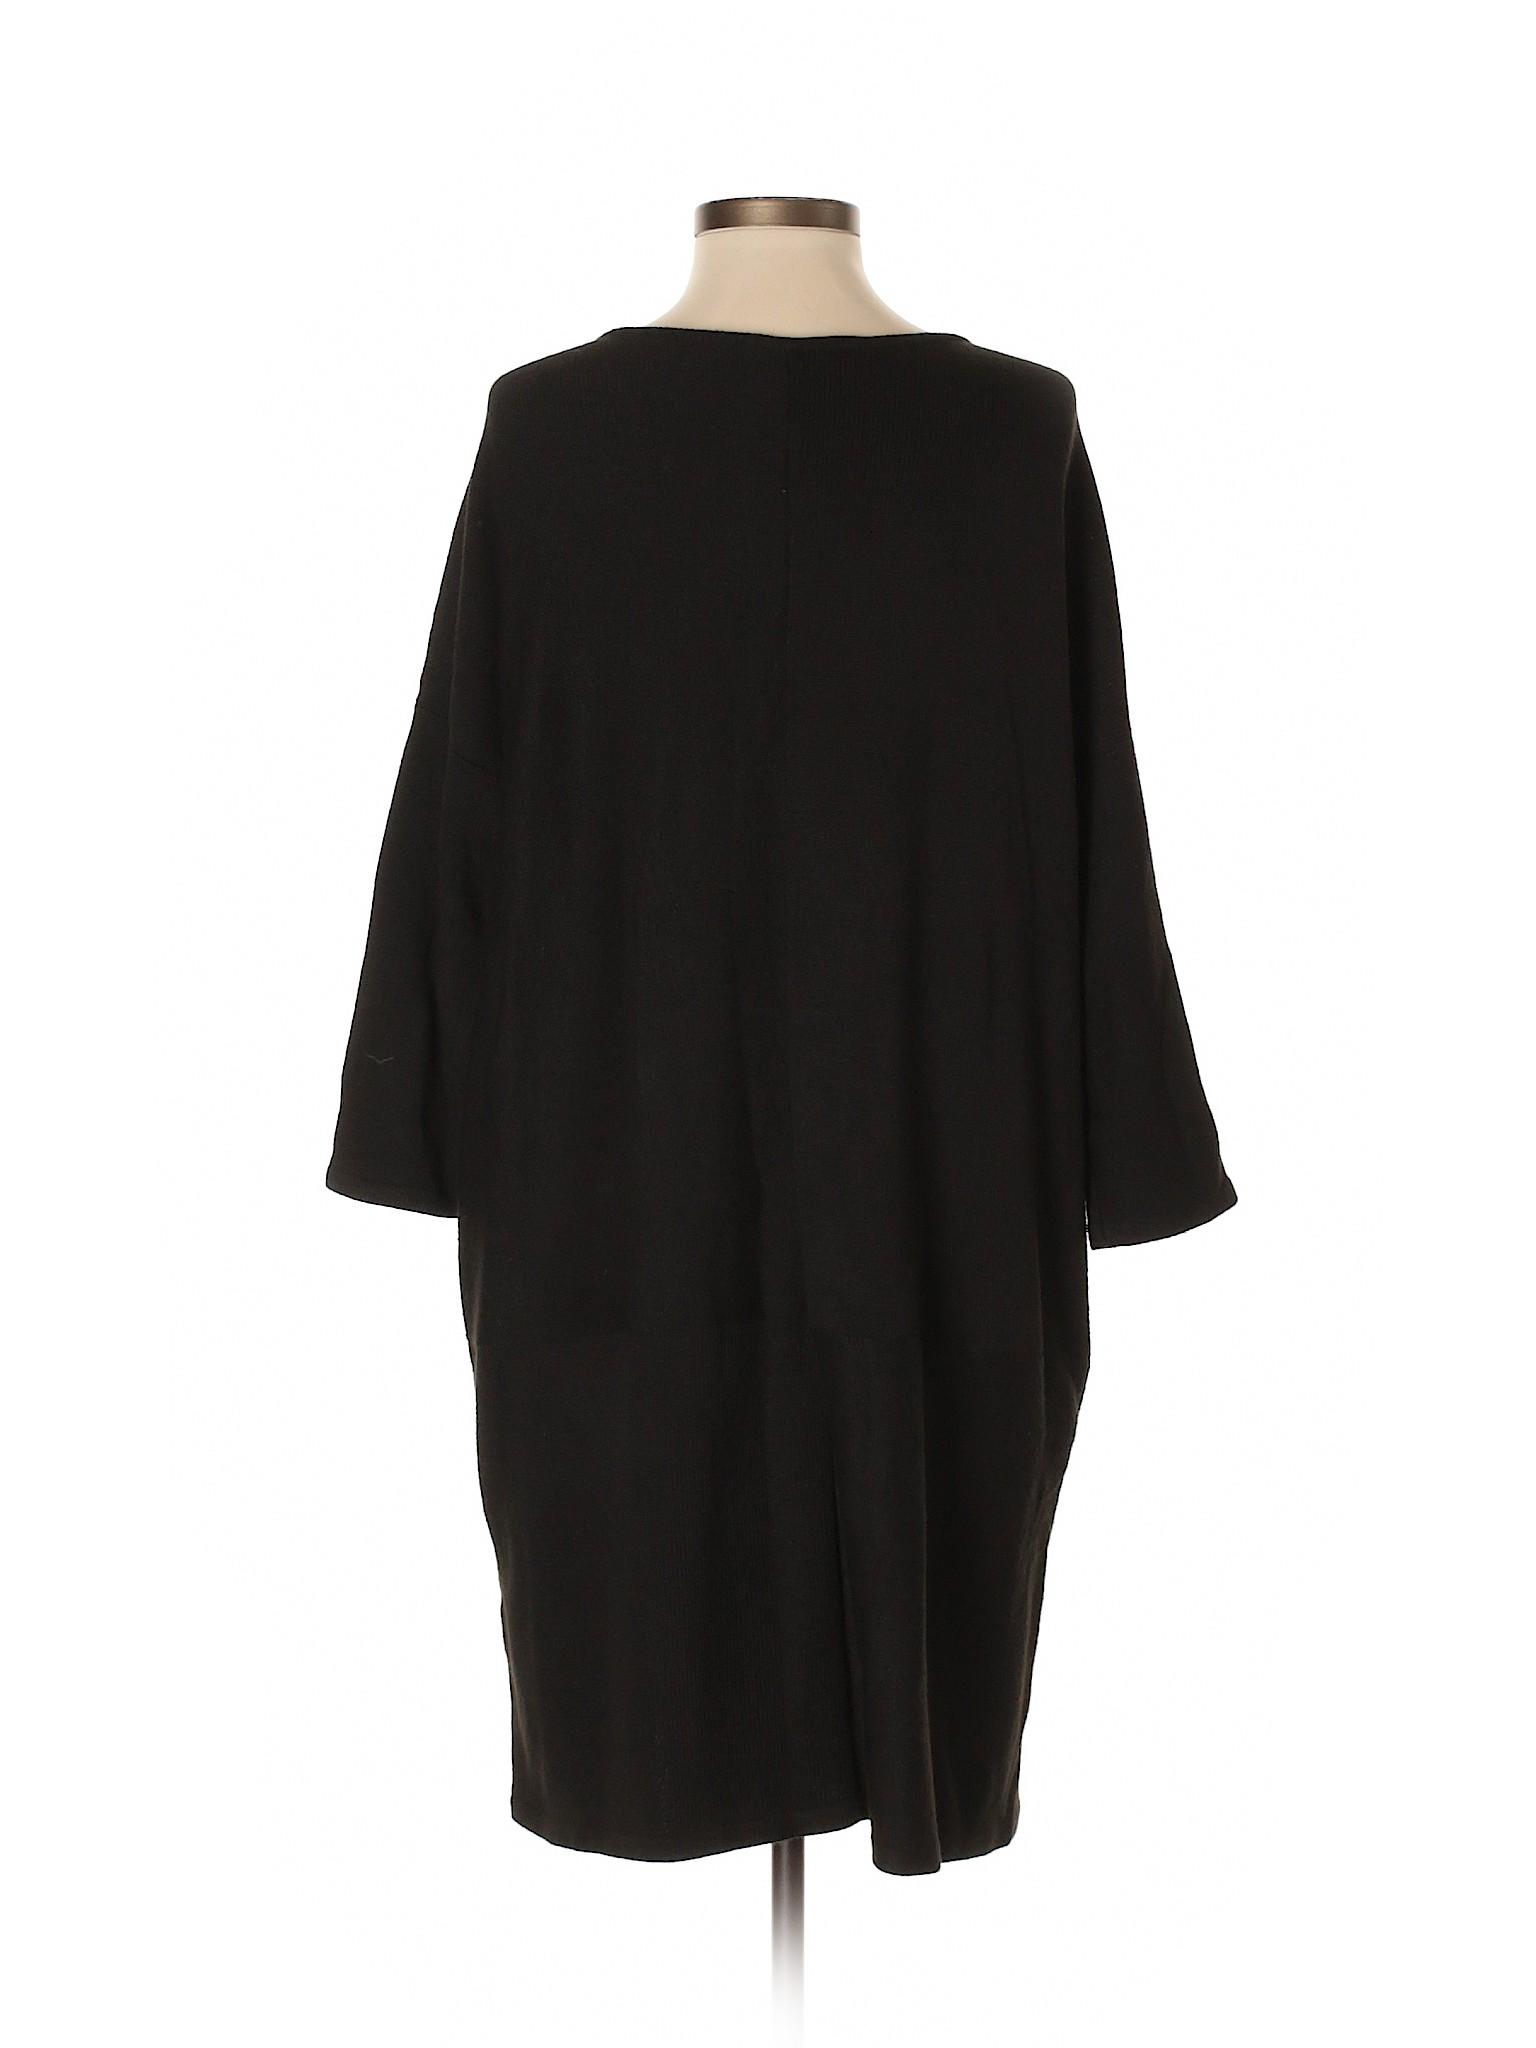 winter Dress Casual Wells Barbara Studio Boutique FOUqRdxF